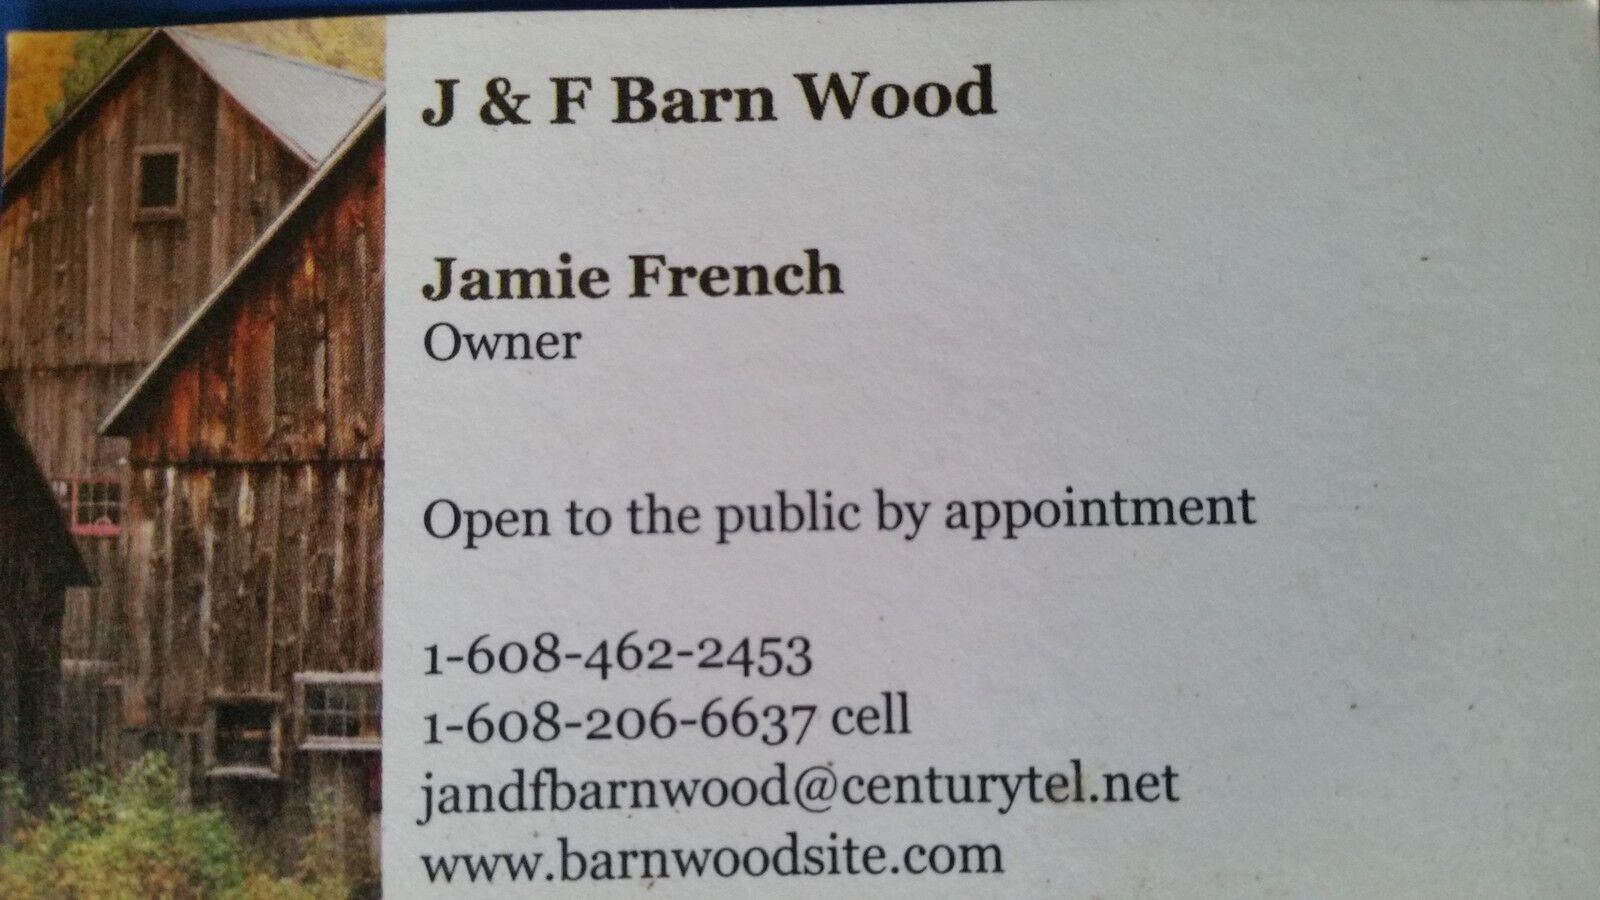 J&FBarnWood